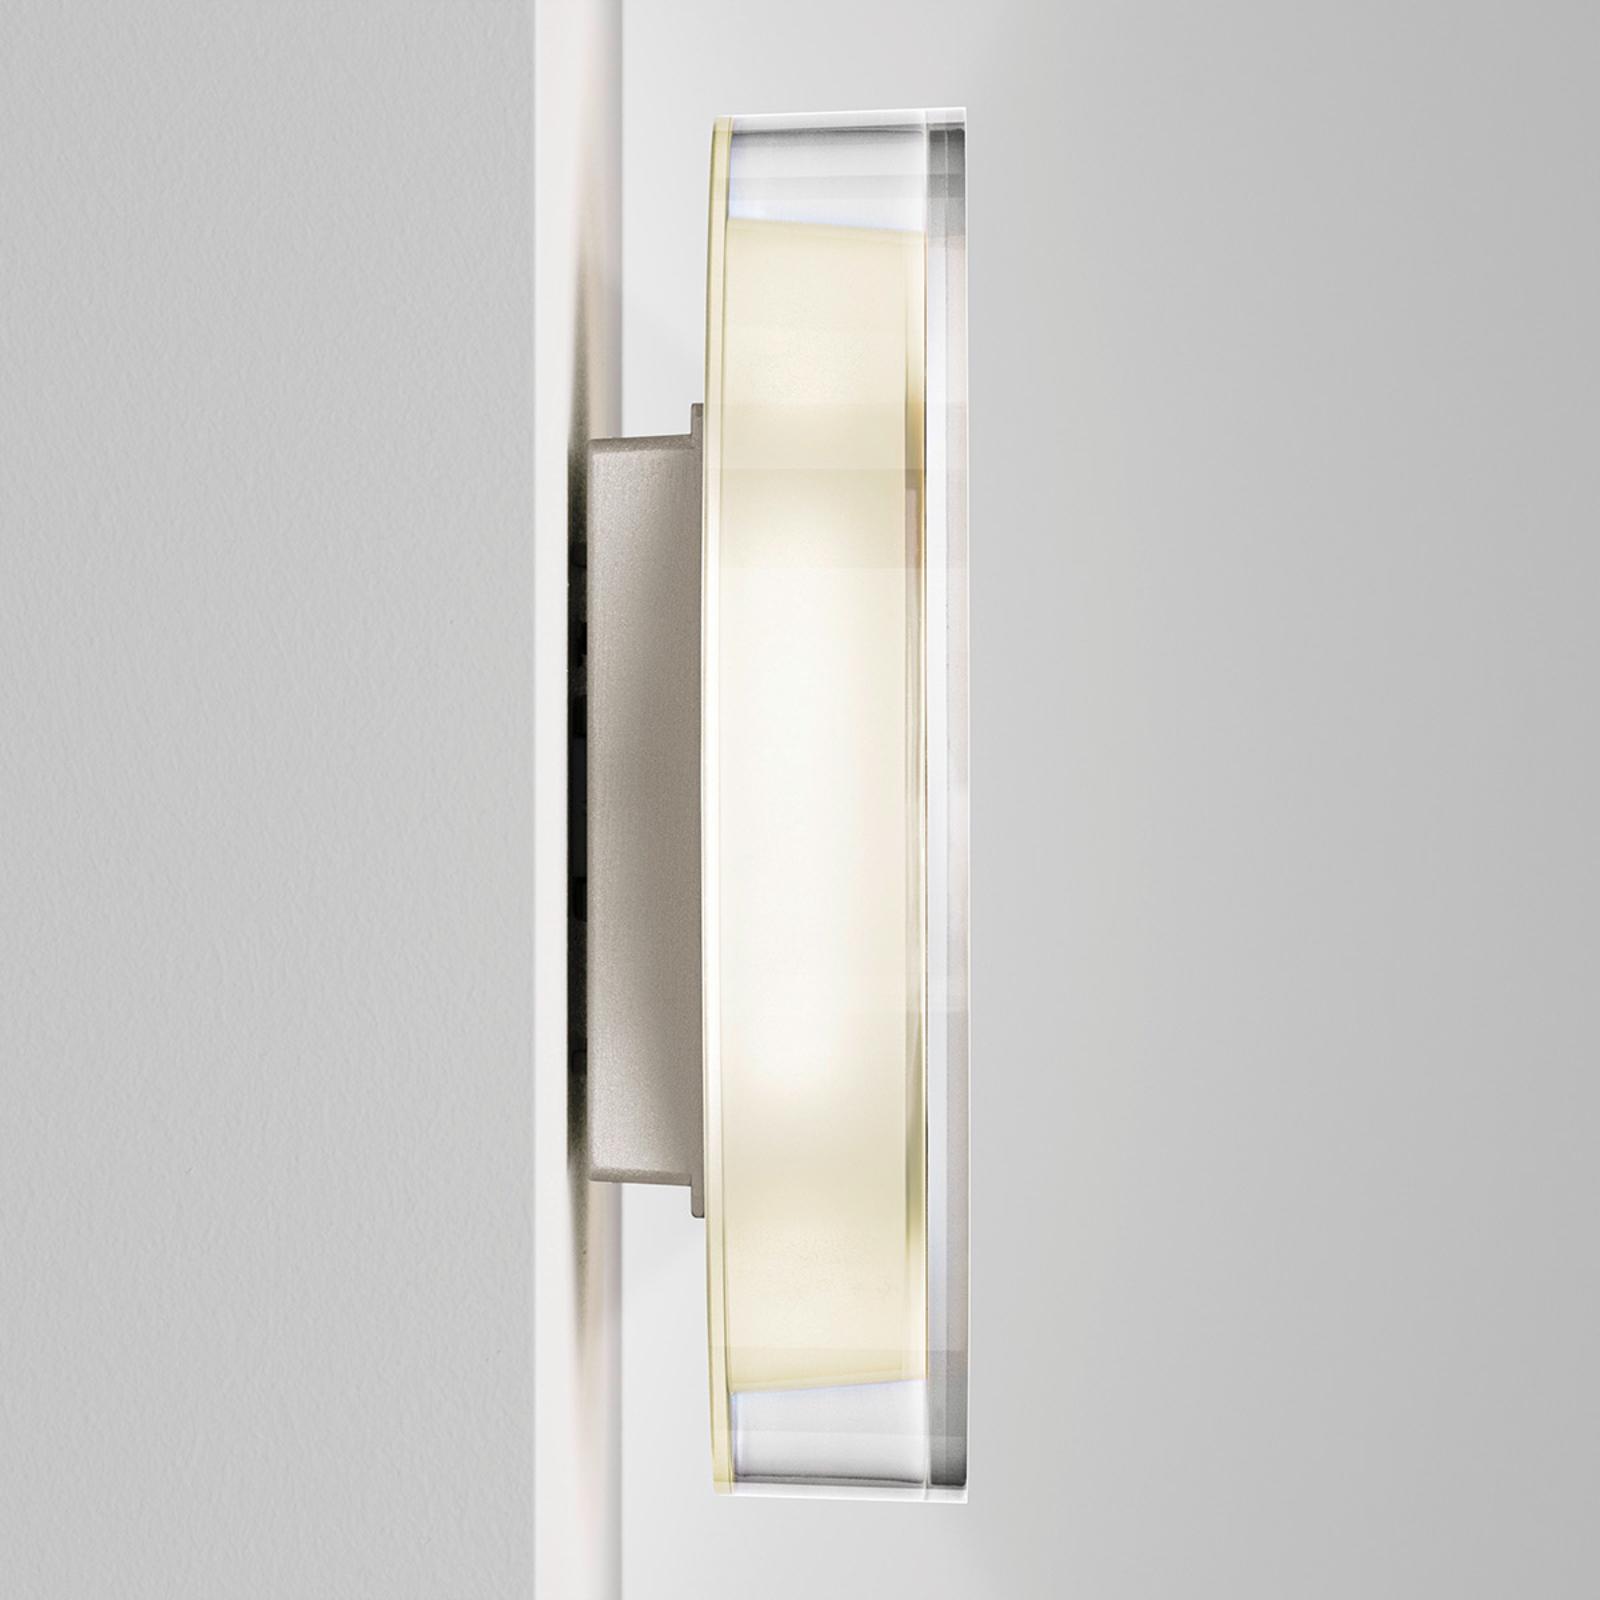 serien.lighting Lid - verspiegelte LED-Wandlampe